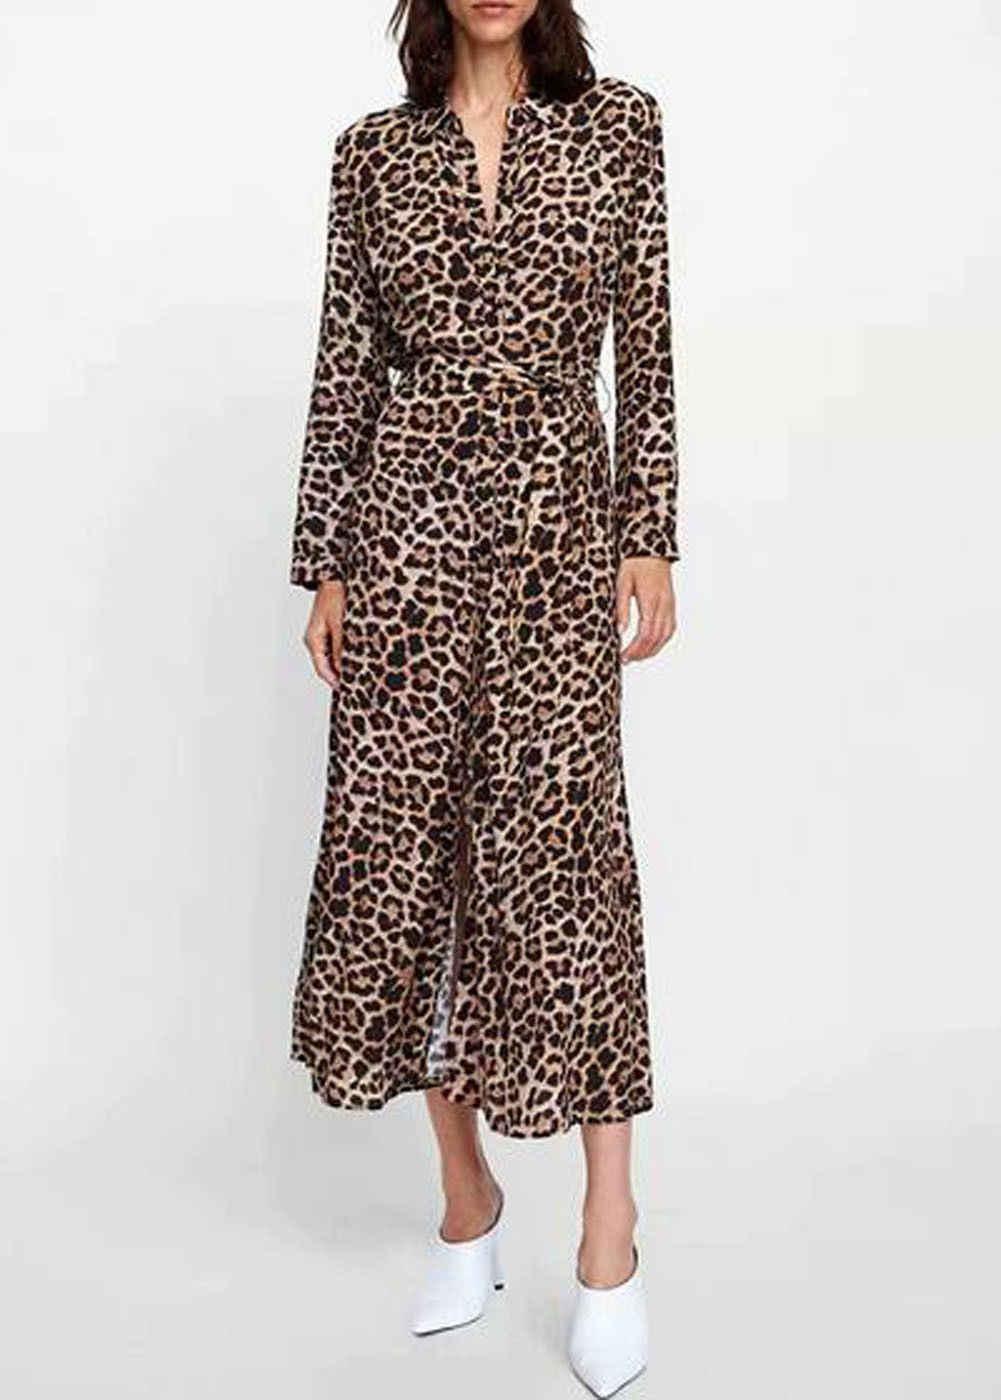 d62ec849c4e ... Ladies Casual Leopard Print V-Neck Slit Belt Dresses Women Autumn Long  Sleeve Shirt Maxi ...